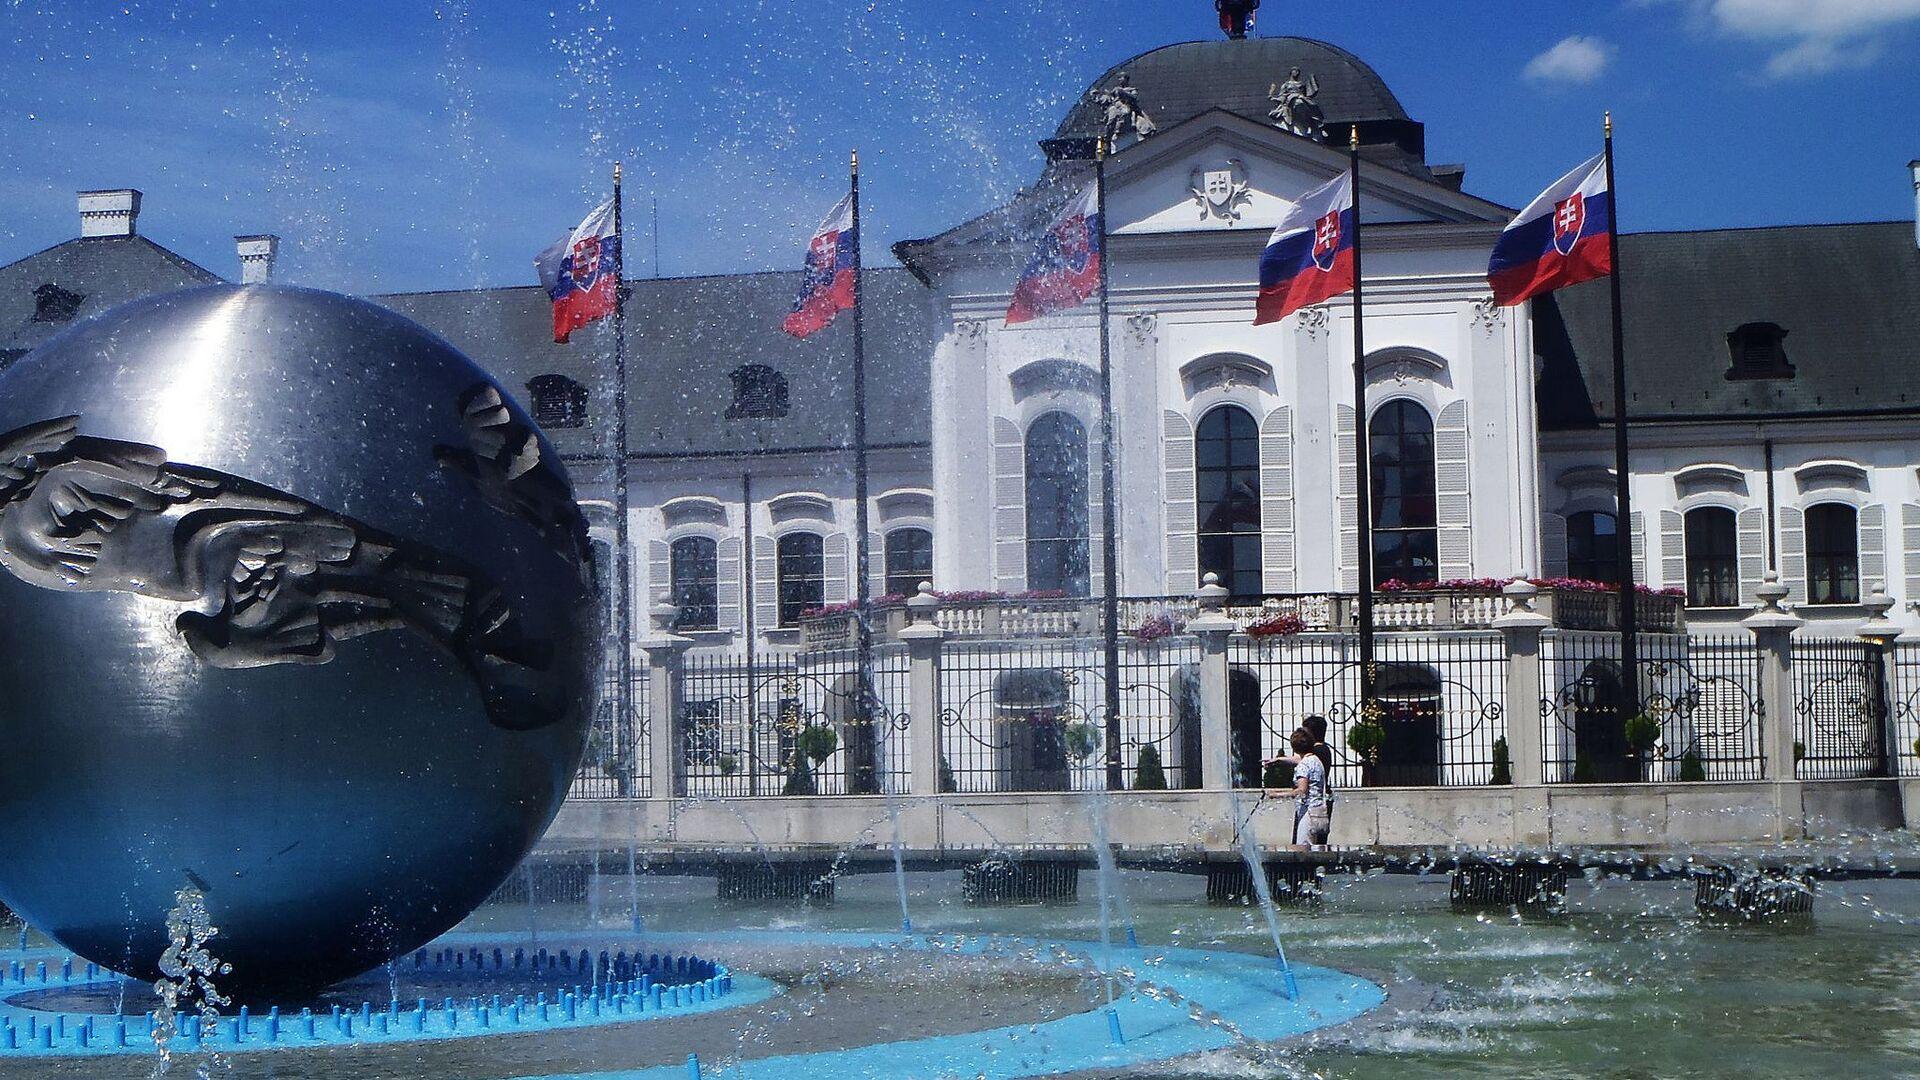 Las banderas de Eslovaquia - Sputnik Mundo, 1920, 02.04.2021